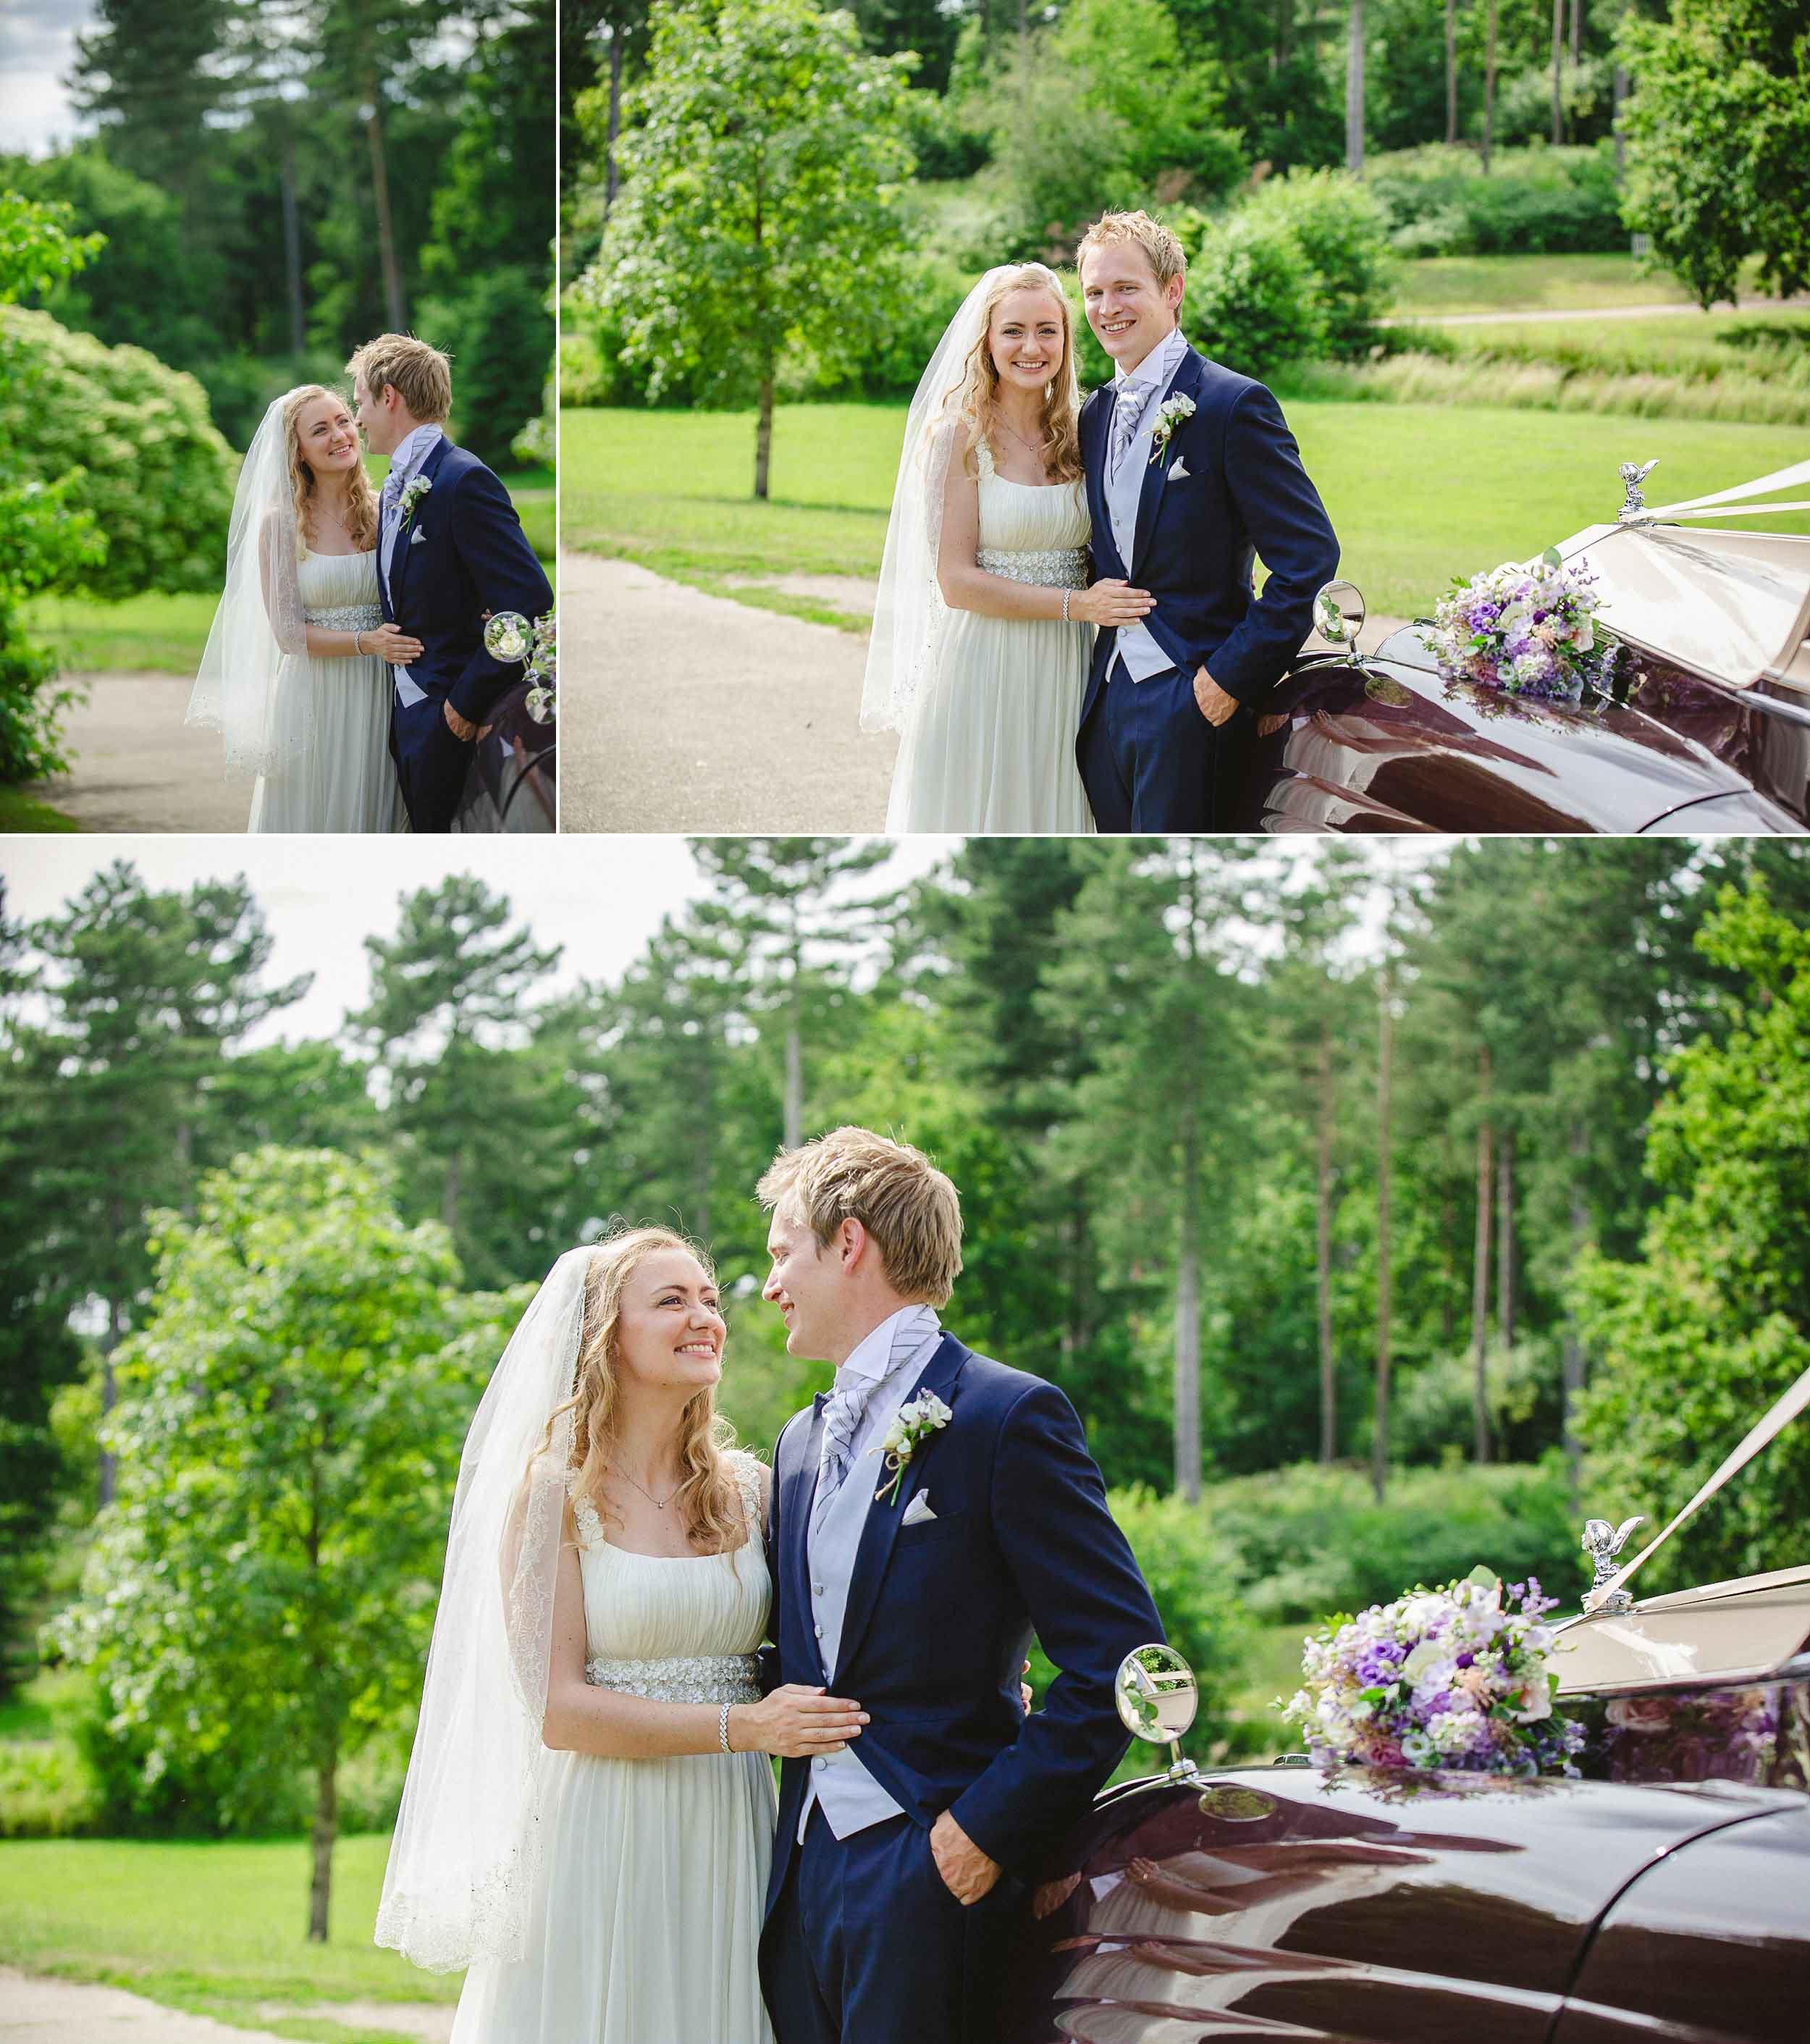 Marks-Hall-Wedding-Photographer-35.jpg